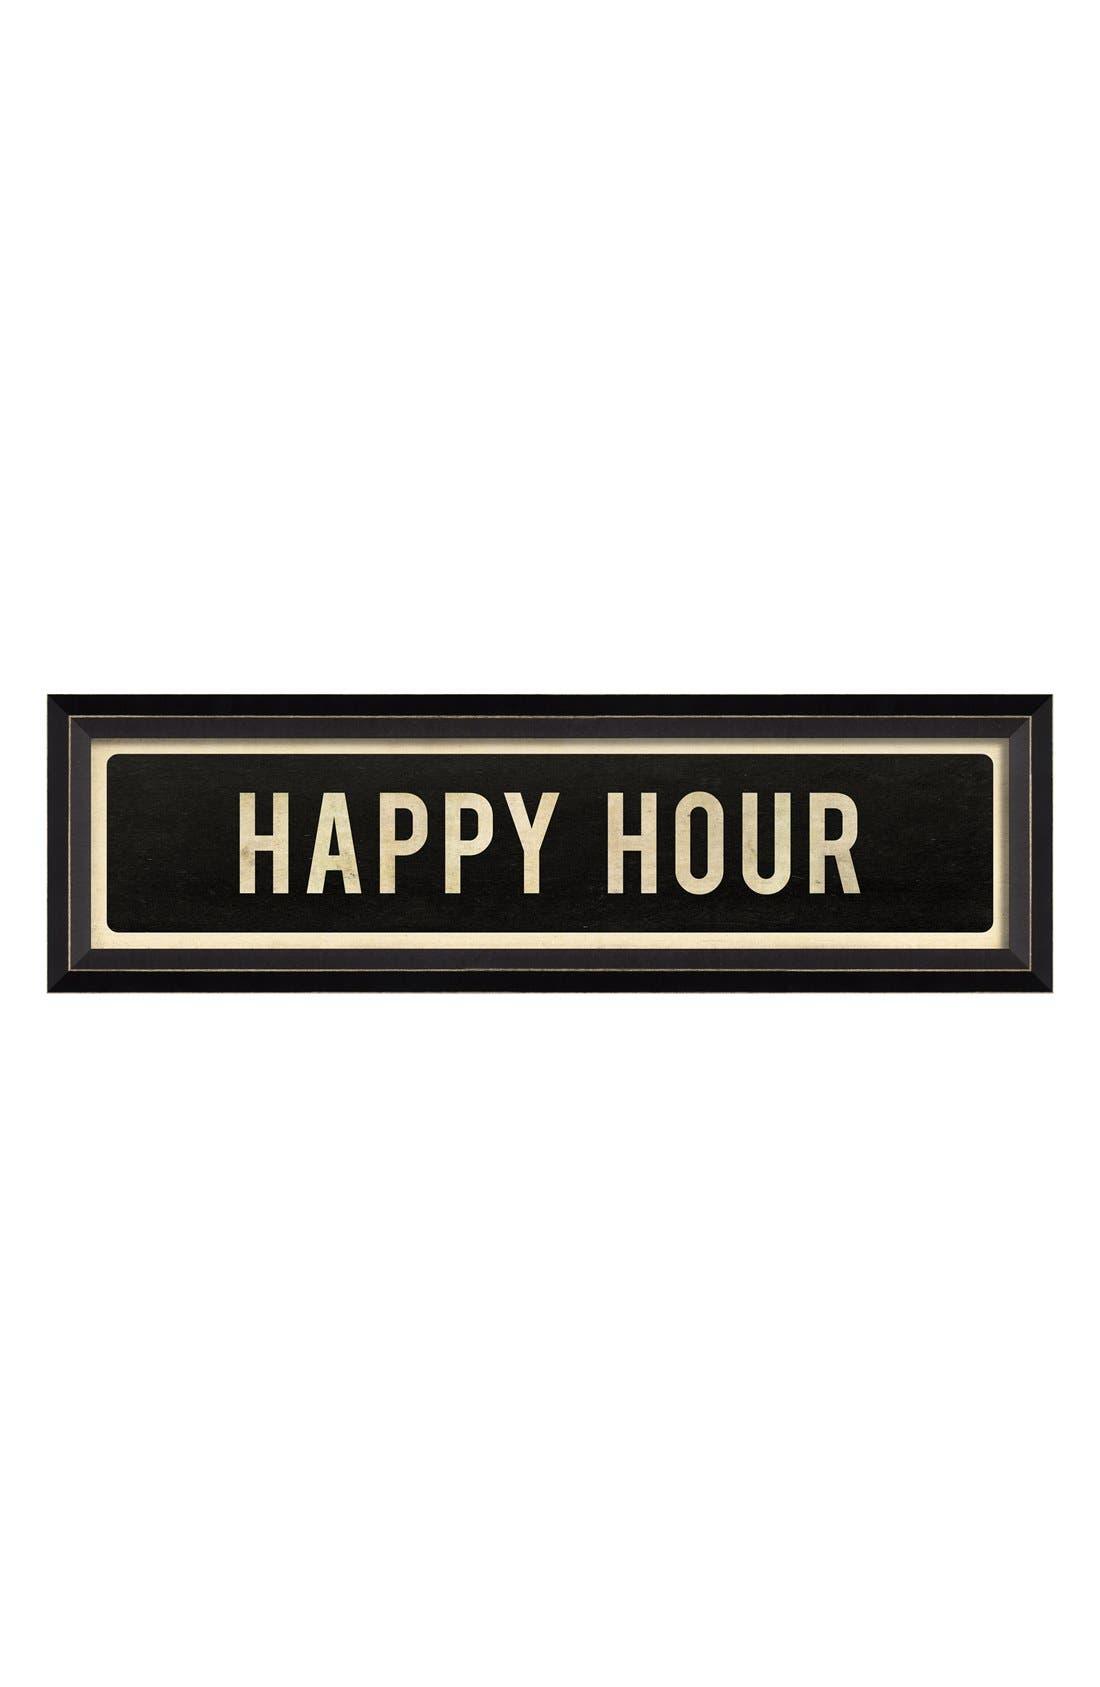 'Happy Hour' Vintage Look Street Sign Artwork,                         Main,                         color, Black